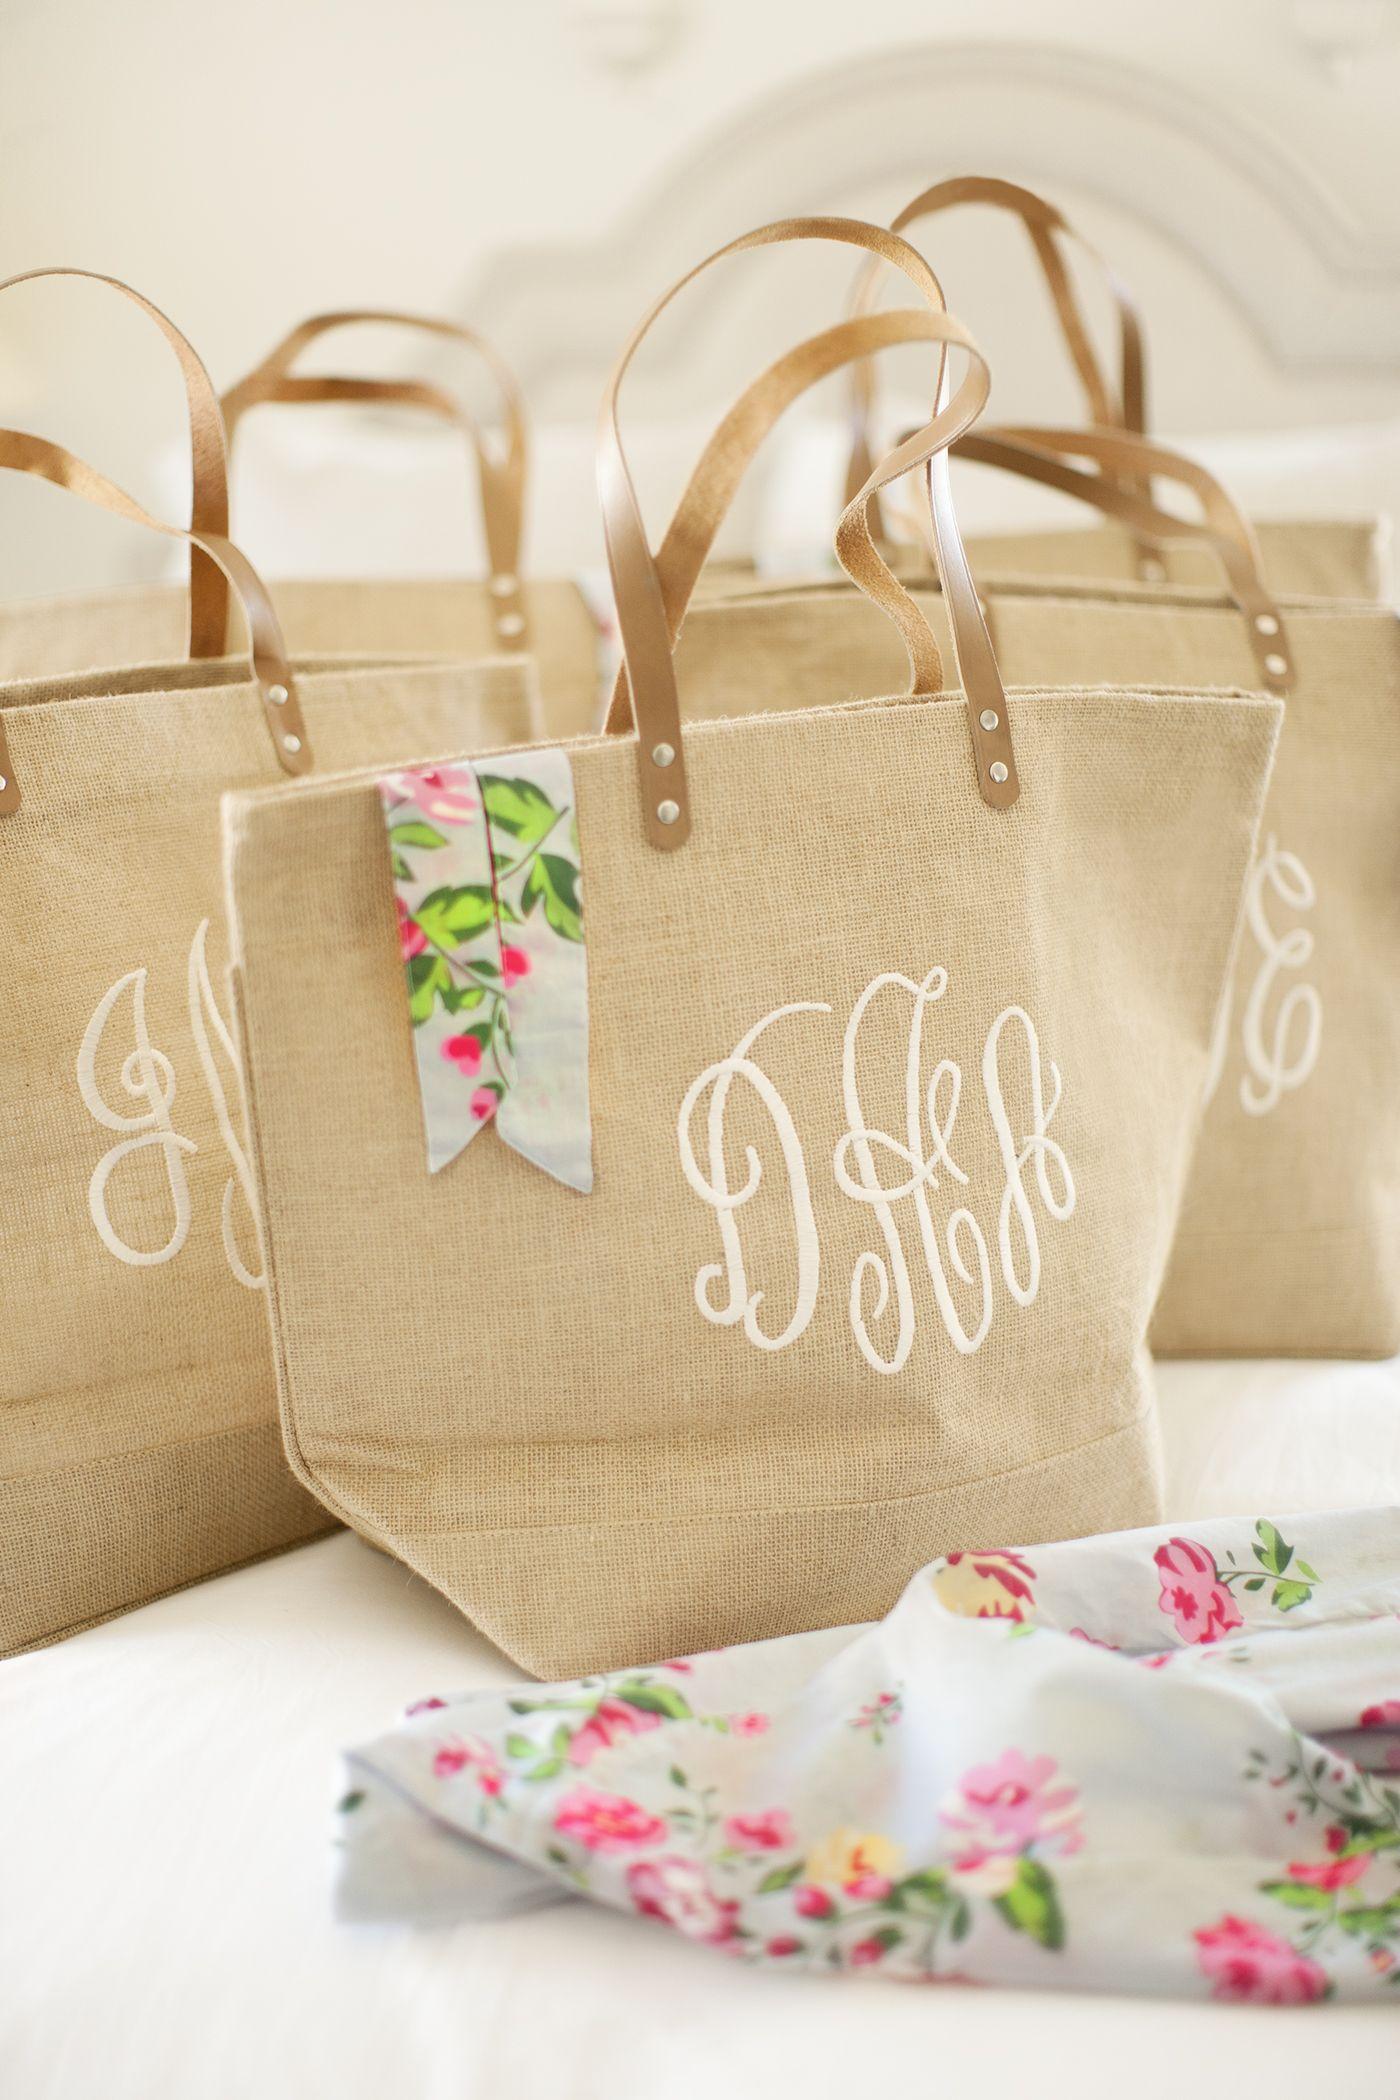 Rosemary Beach Wedding Alys Seaside Bridesmaids Gift Idea Robe Burlap Monogrammed Bag